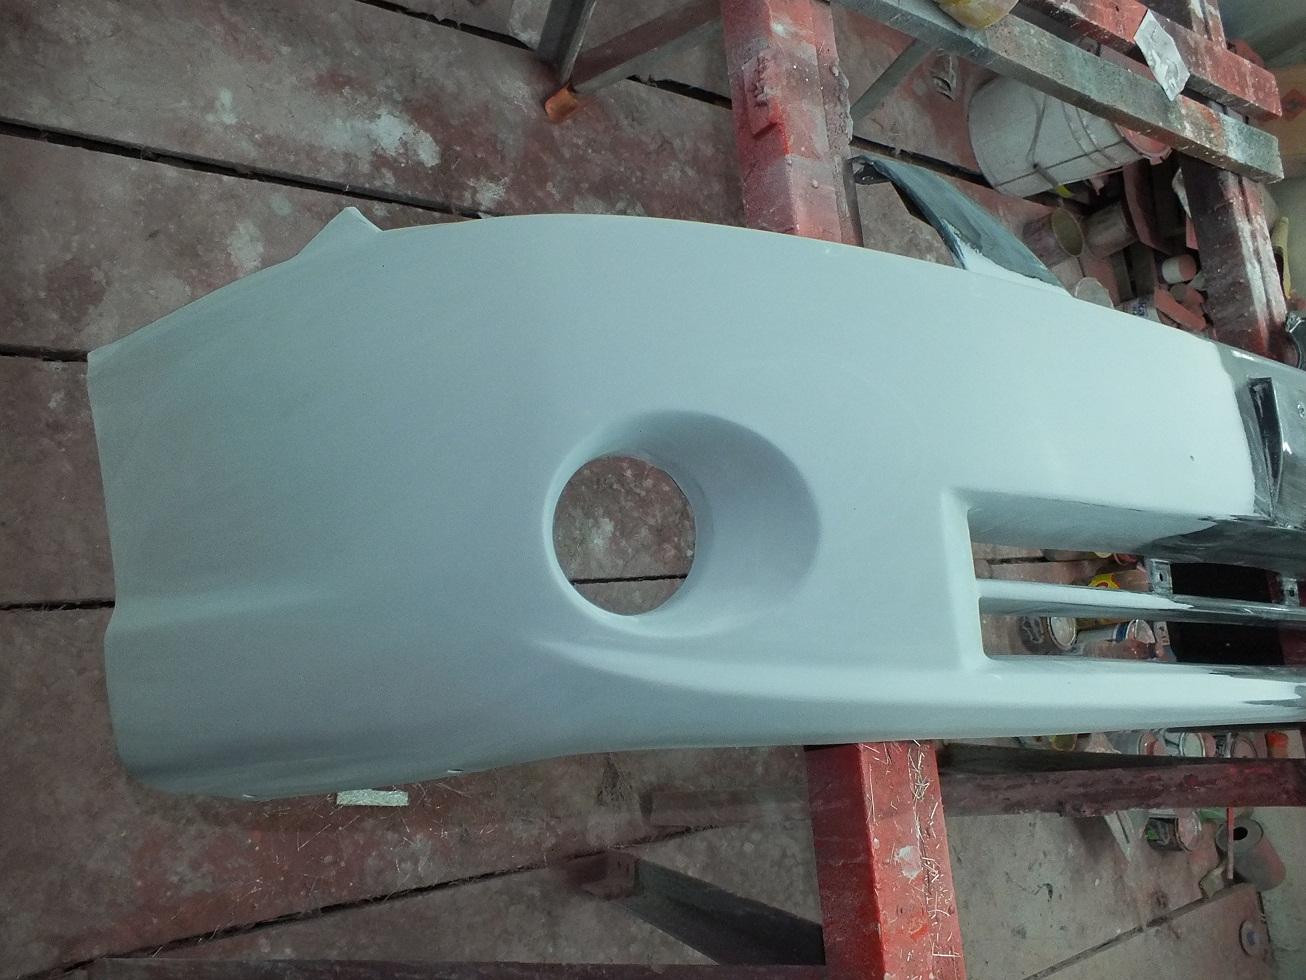 Ремонт бампера своими руками: пайка, шпаклевка и покраска 76